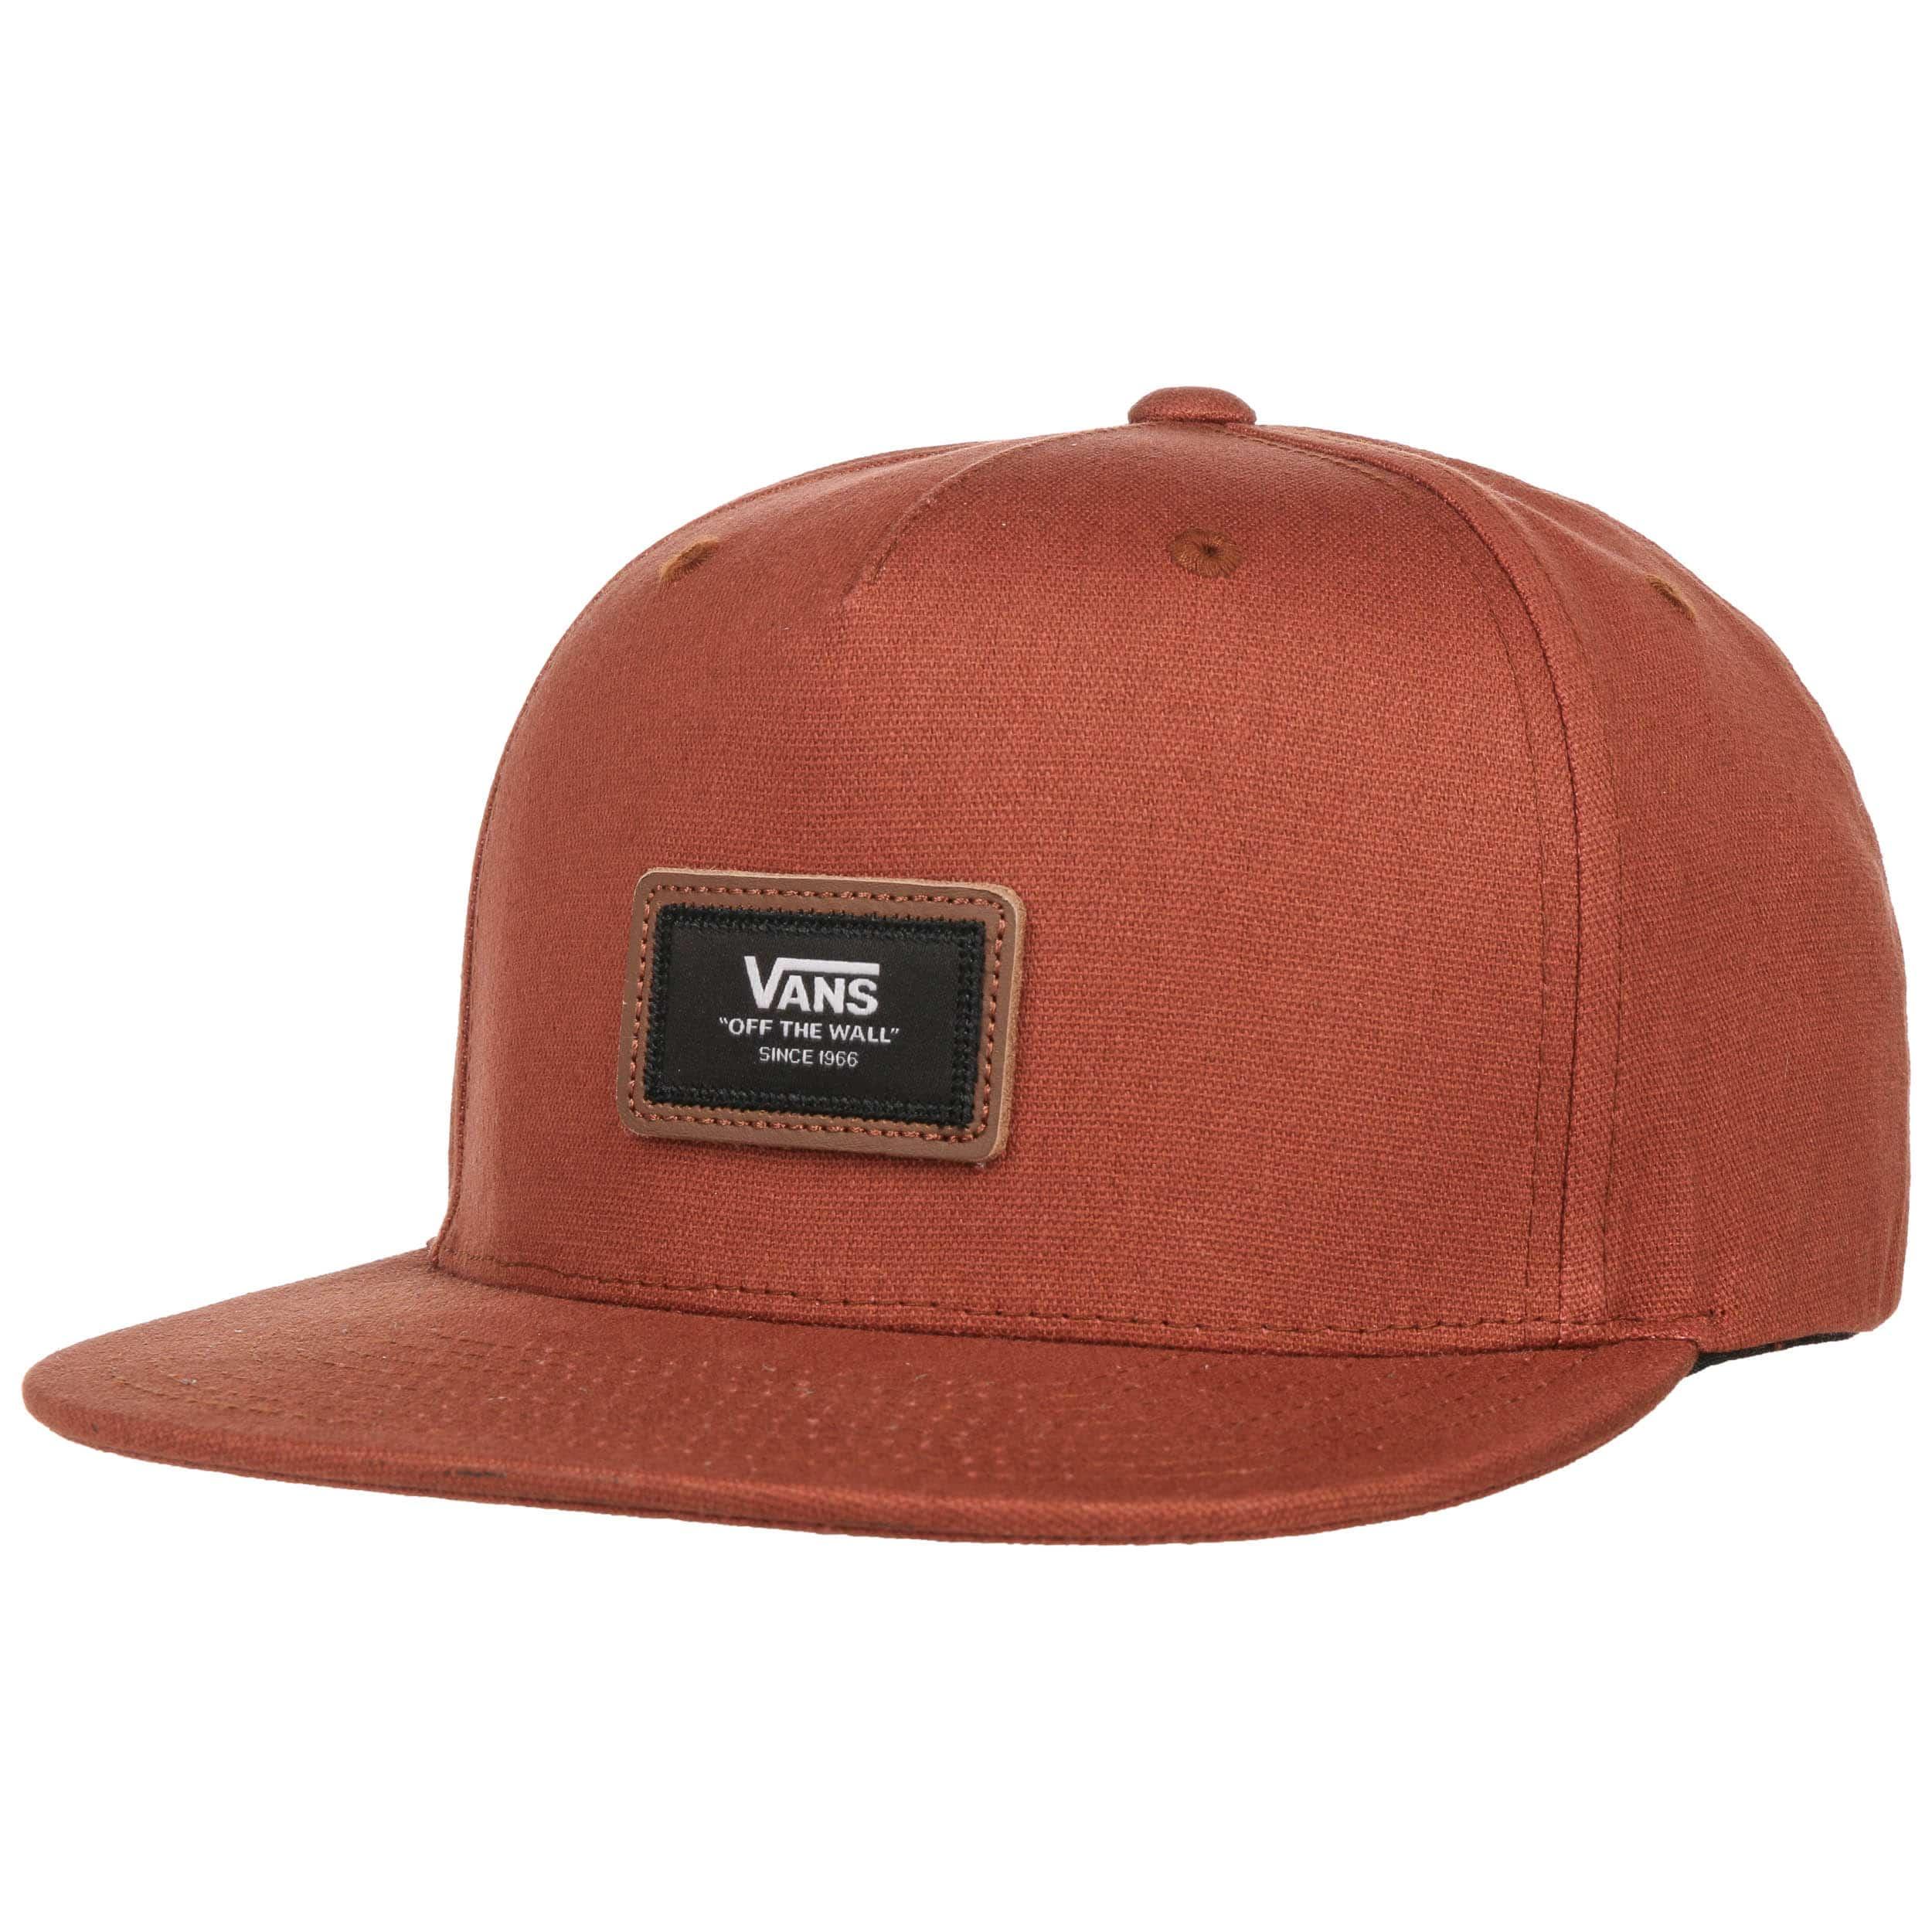 ... Fiske Snapback Cap by Vans - orange 6 643adbc3c7e